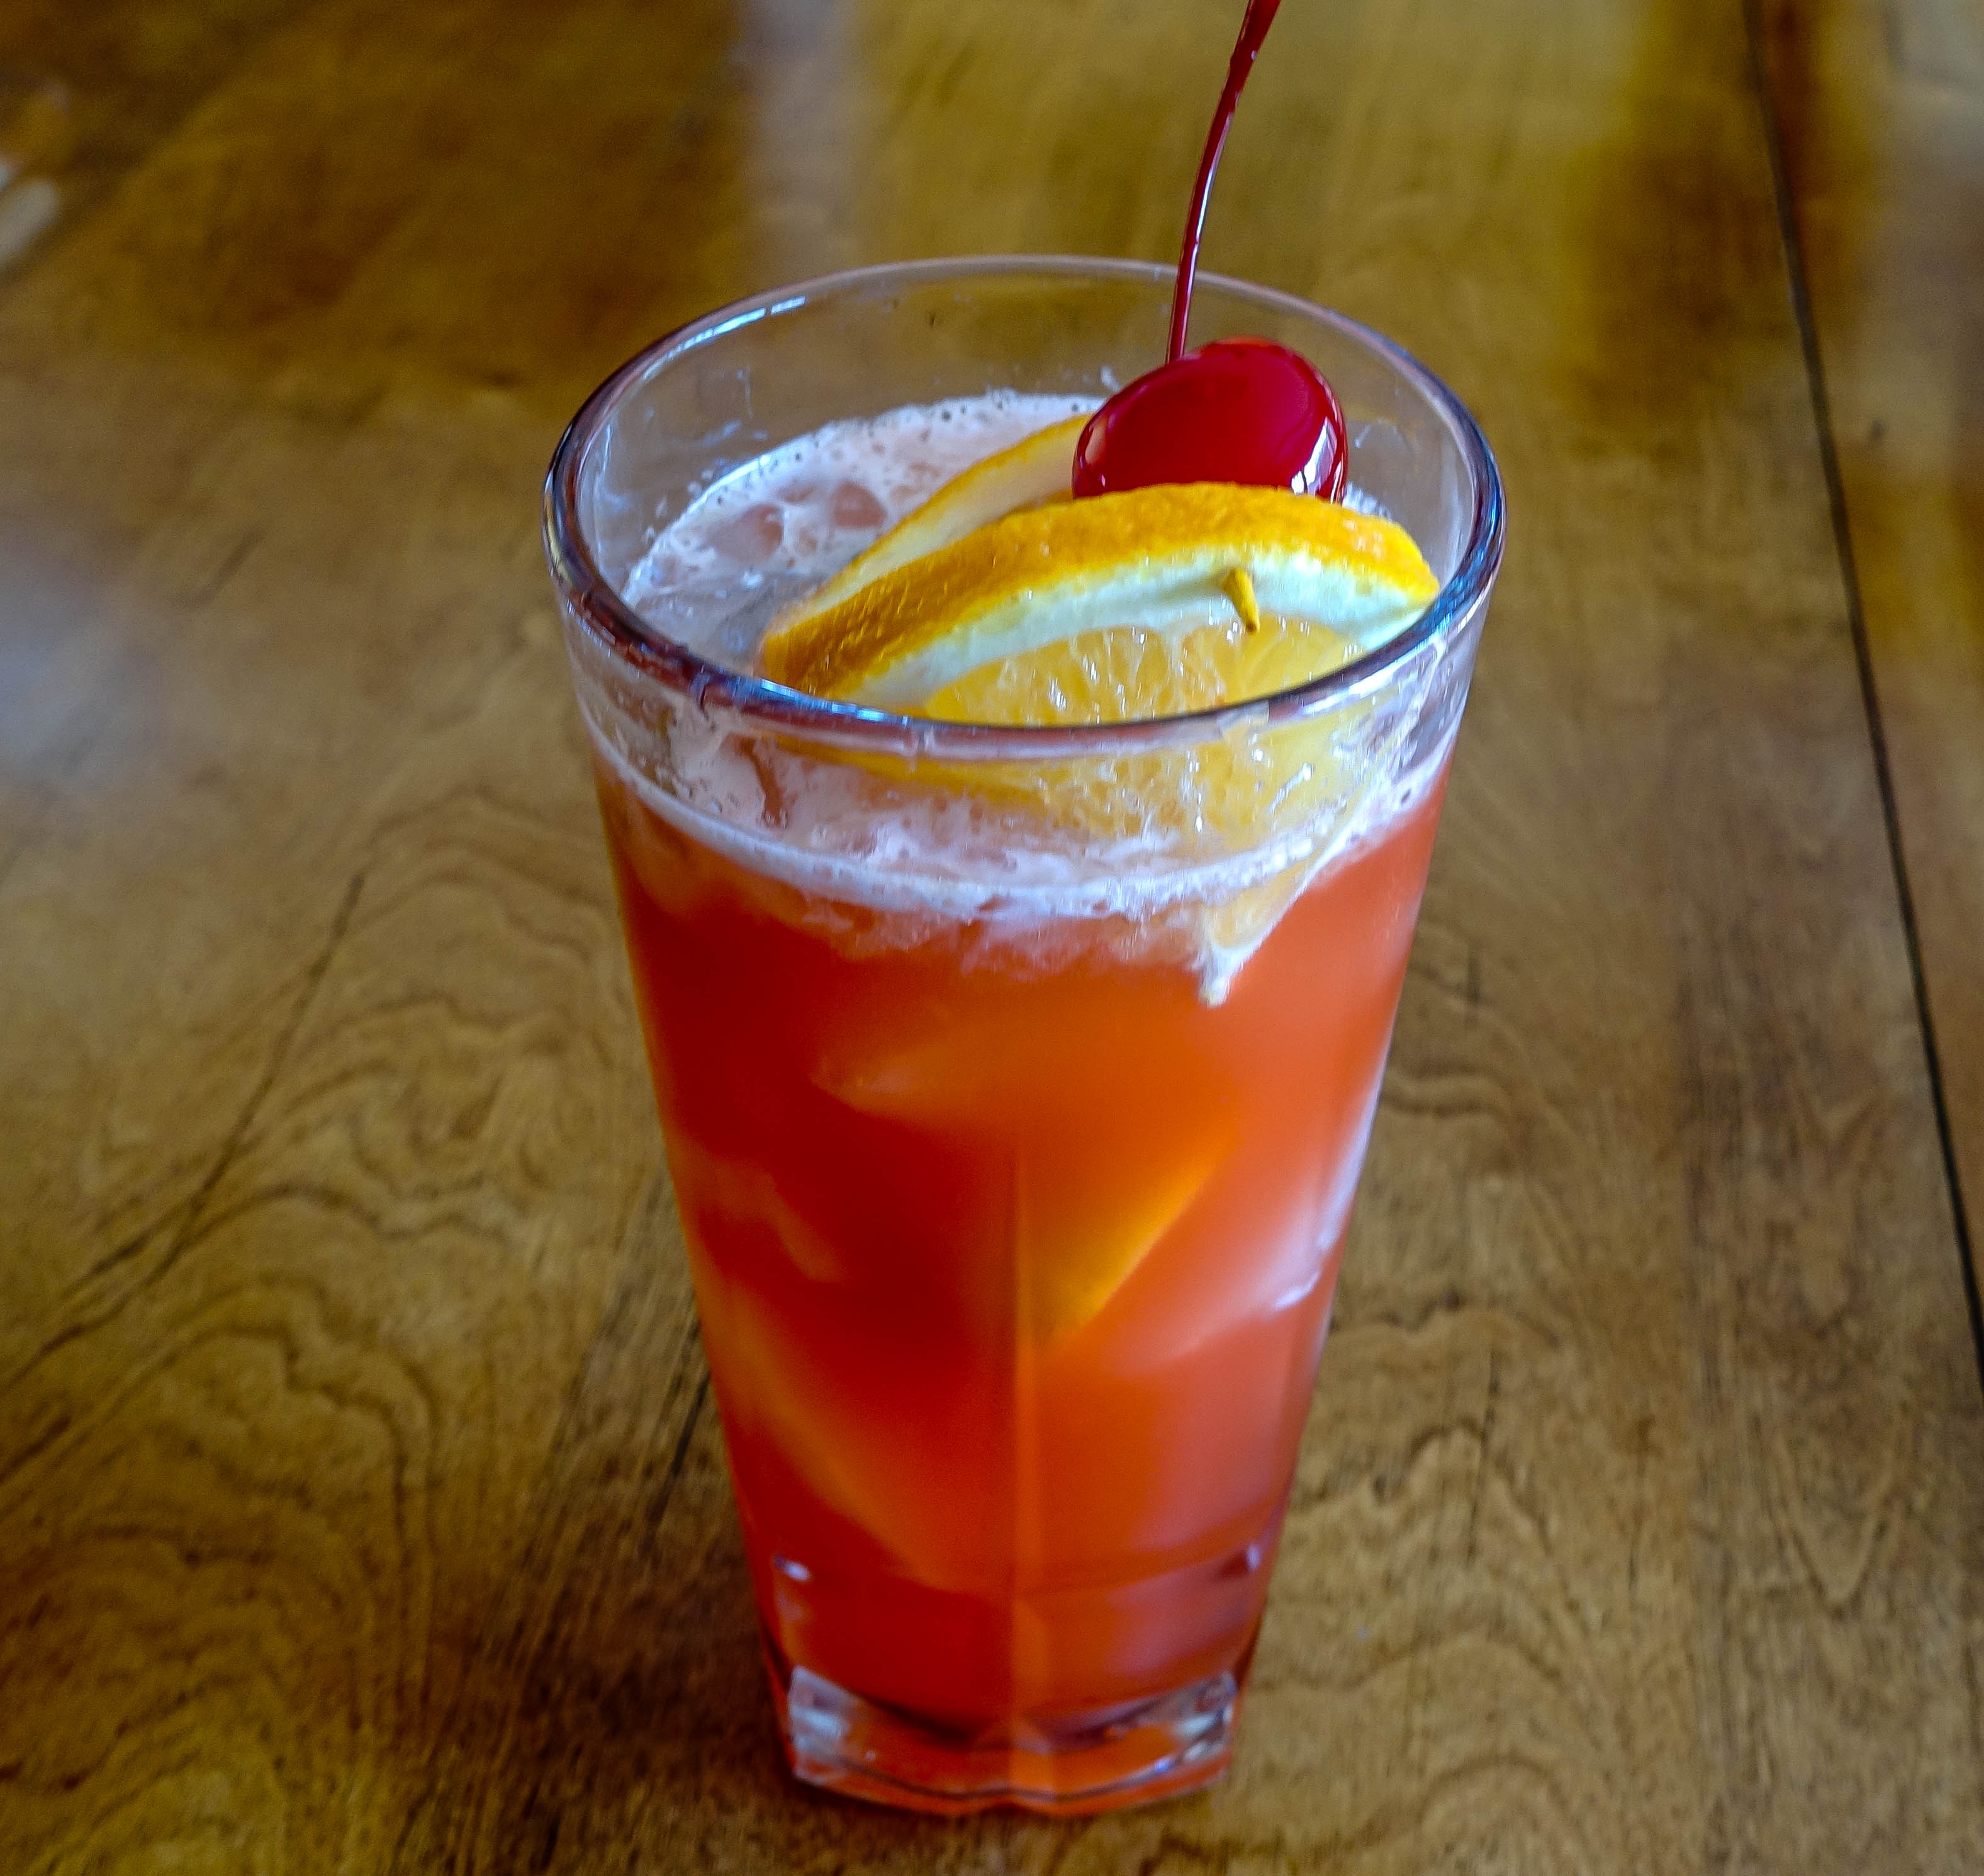 Alcoholic Drink: 19 Of The Best Alcoholic Hawaiian Drinks